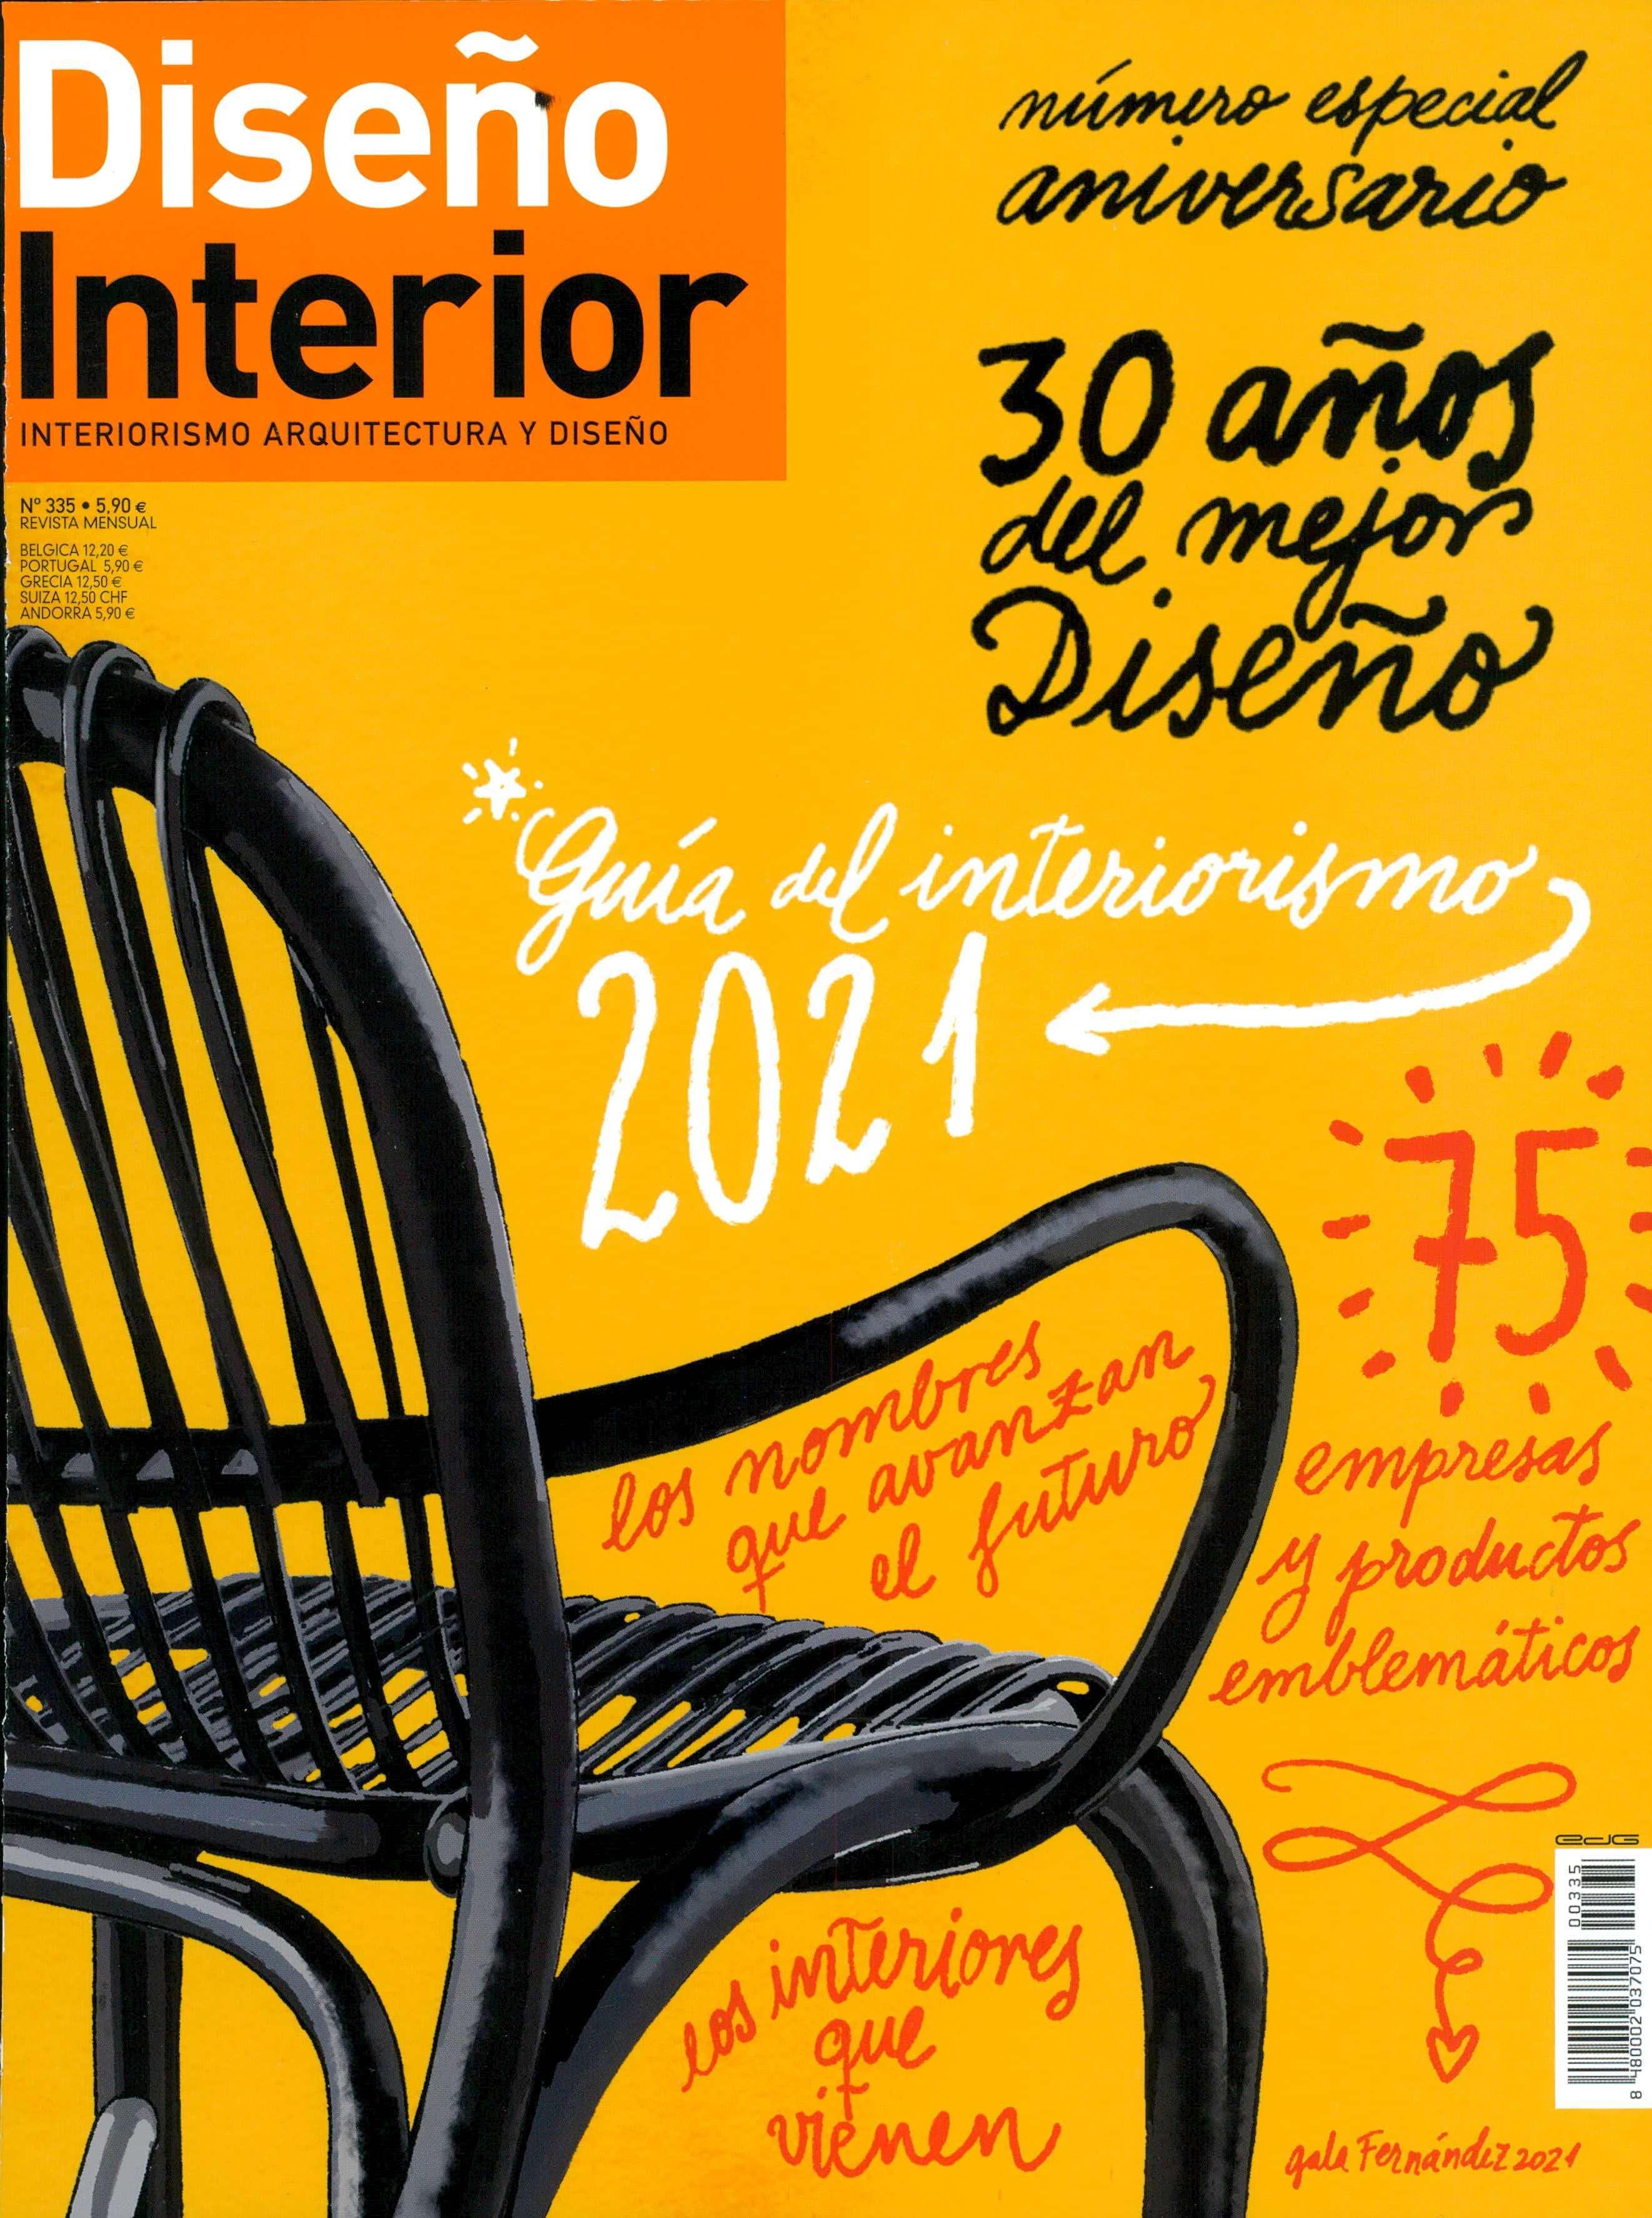 2021.01.01 – Diseno Interior ES – cover